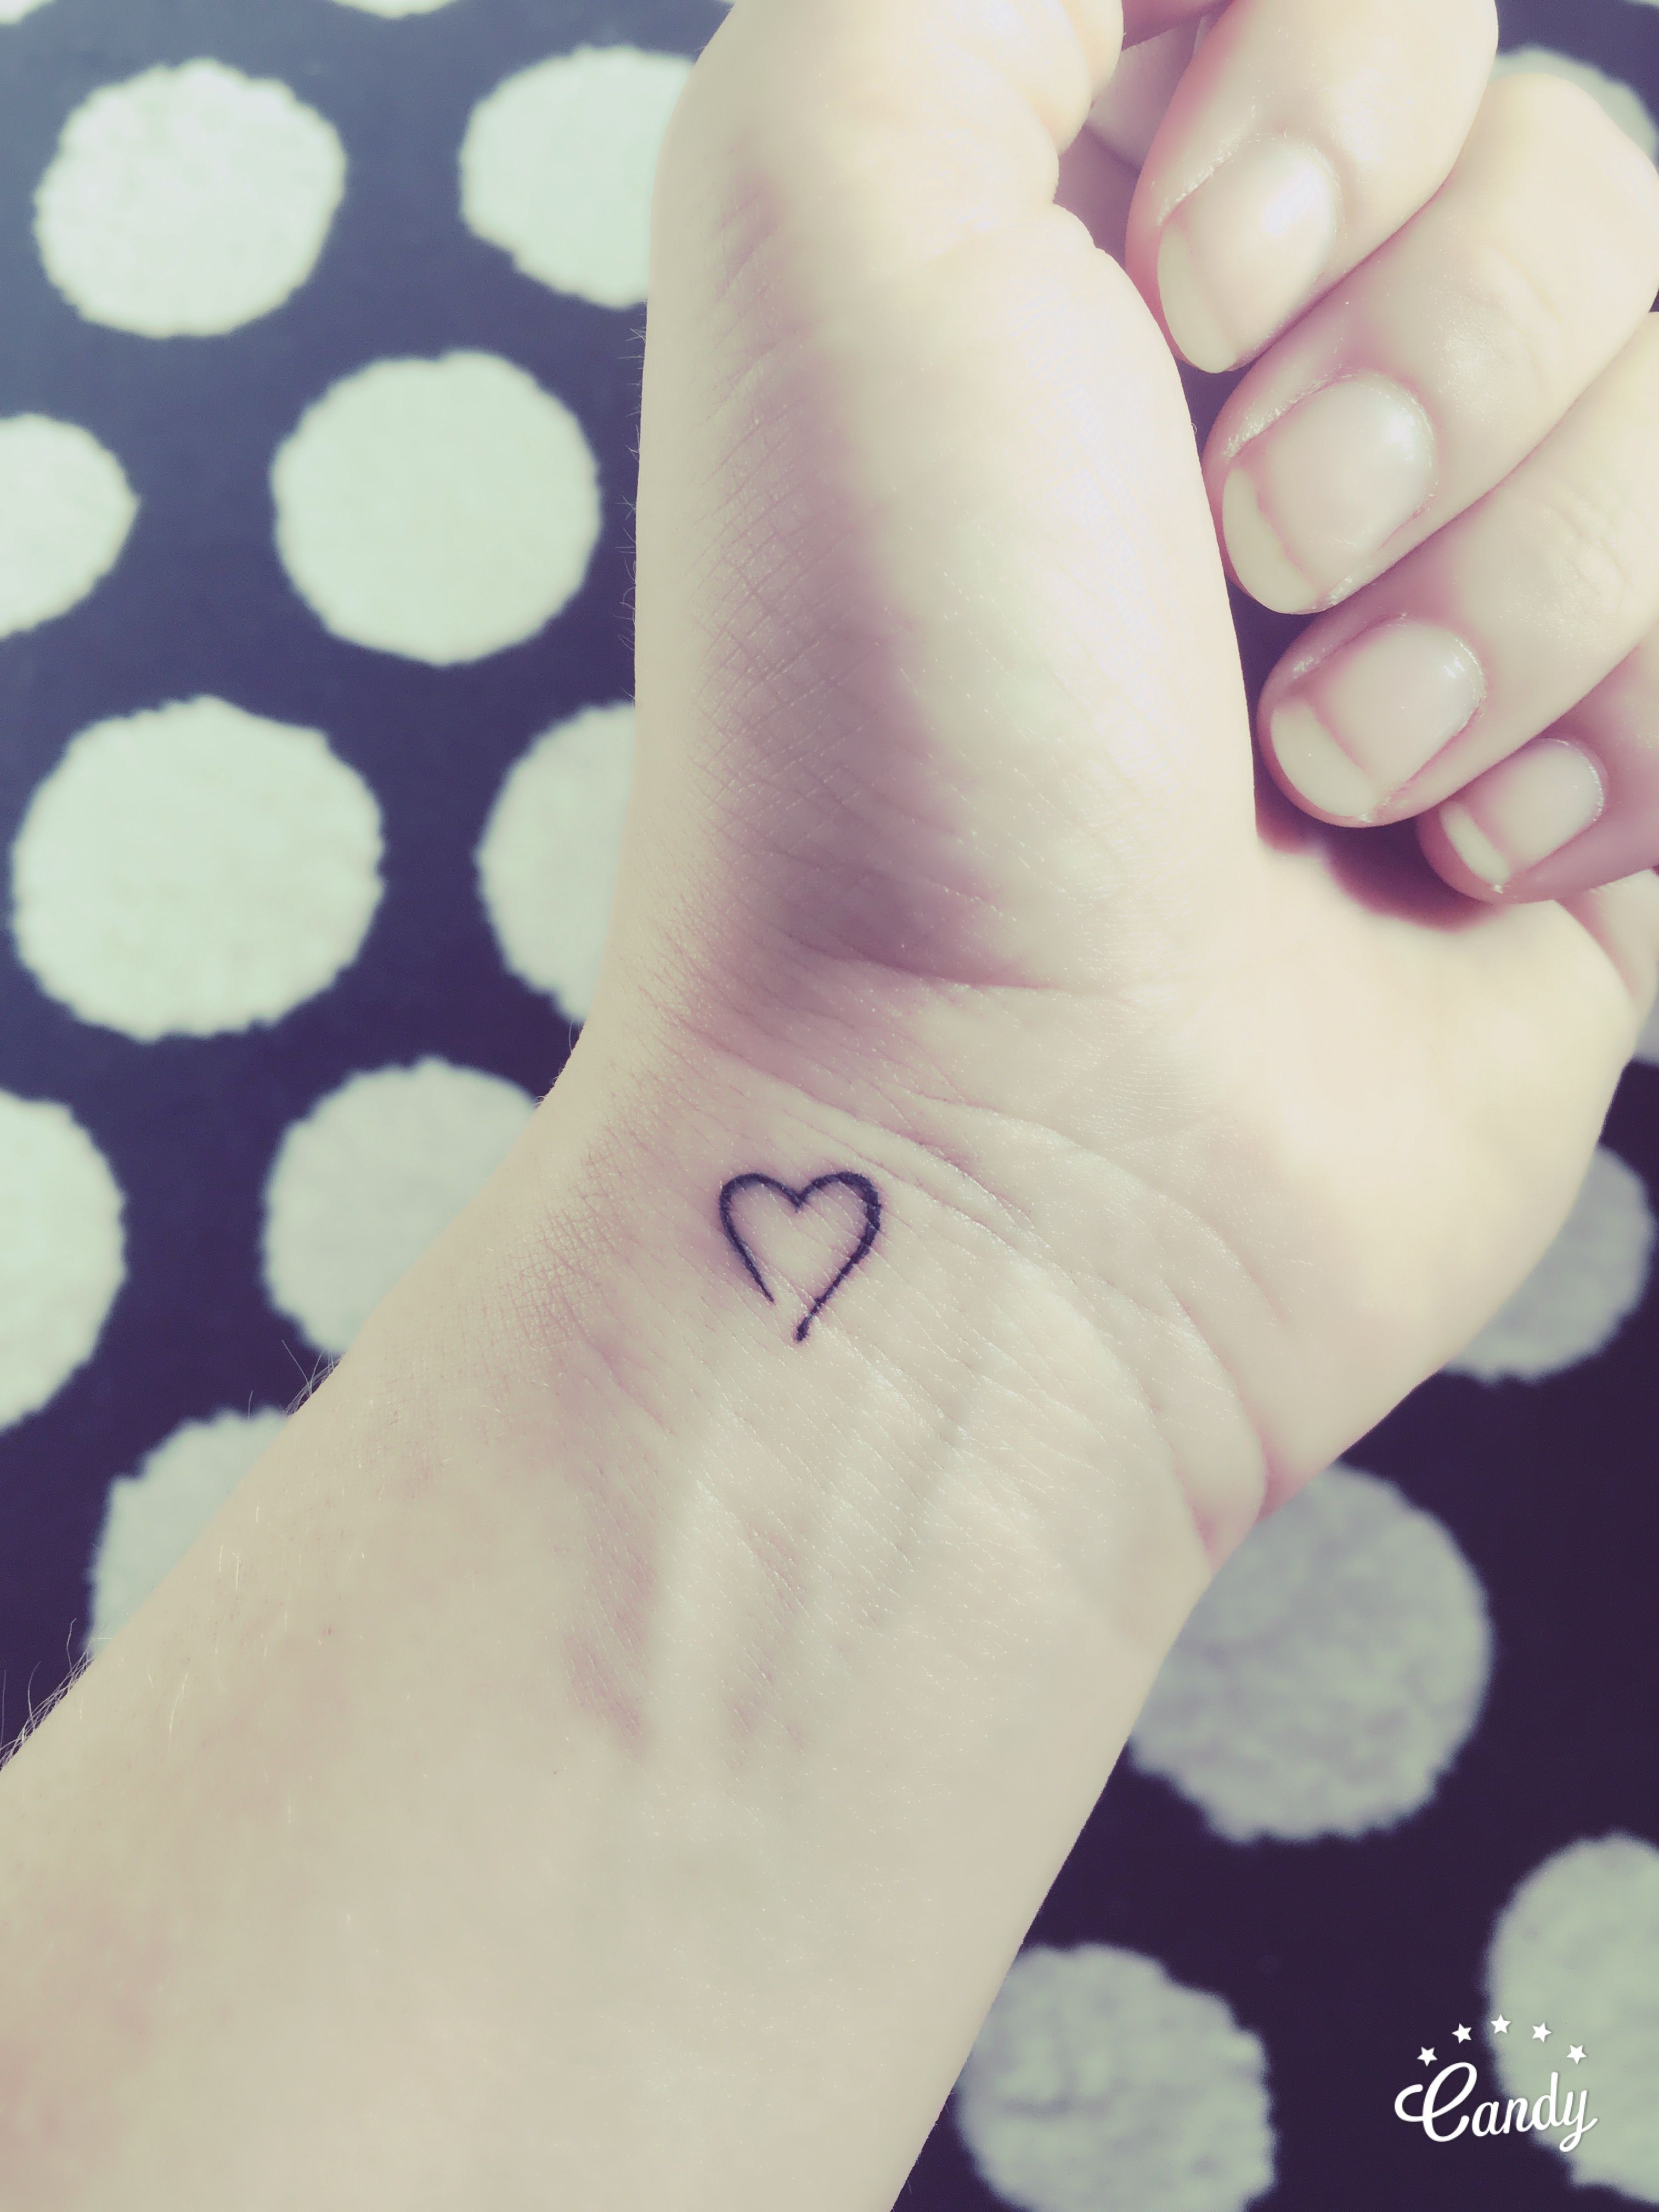 little heart tattoo on wrist een klein hartje op de pols. Black Bedroom Furniture Sets. Home Design Ideas